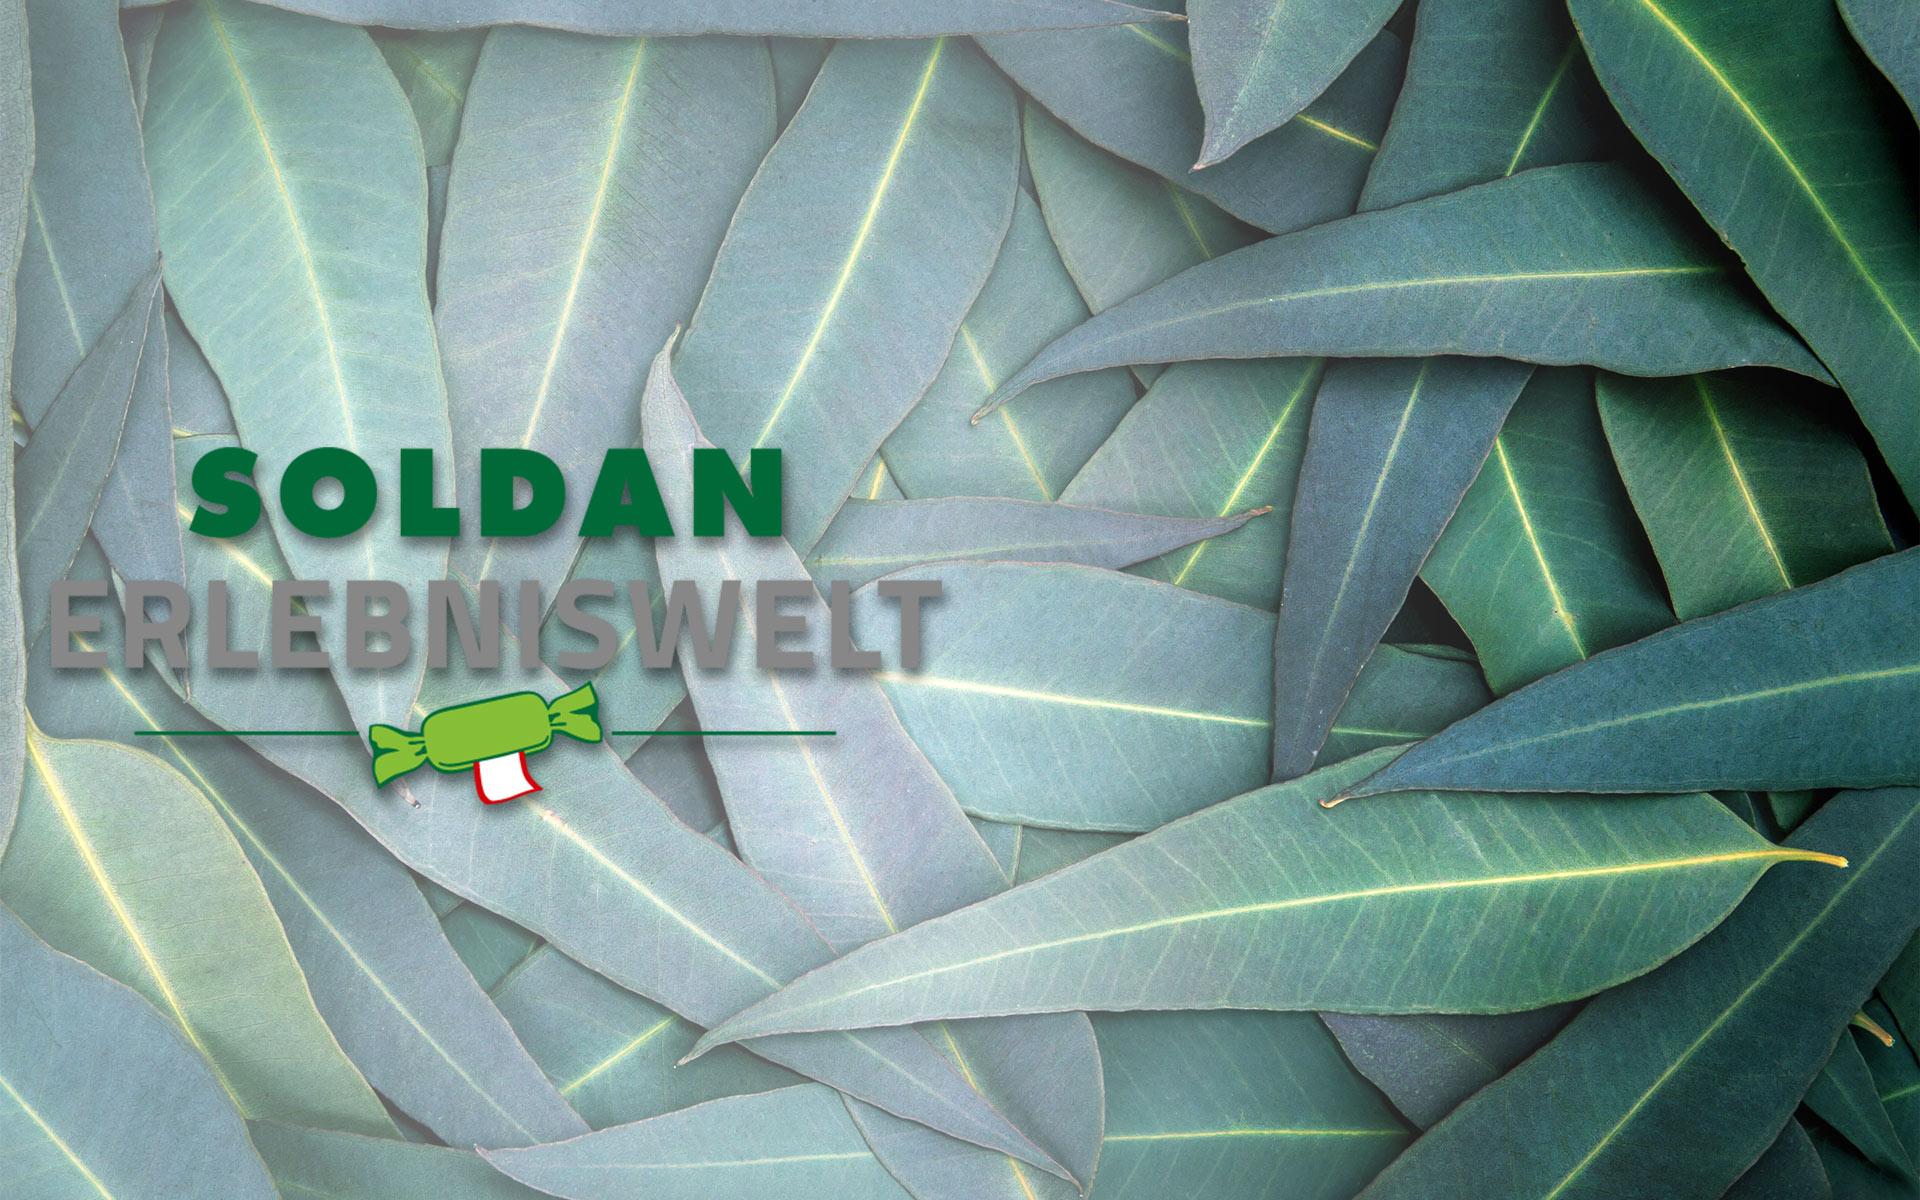 SOLDAN Erlebniswelt